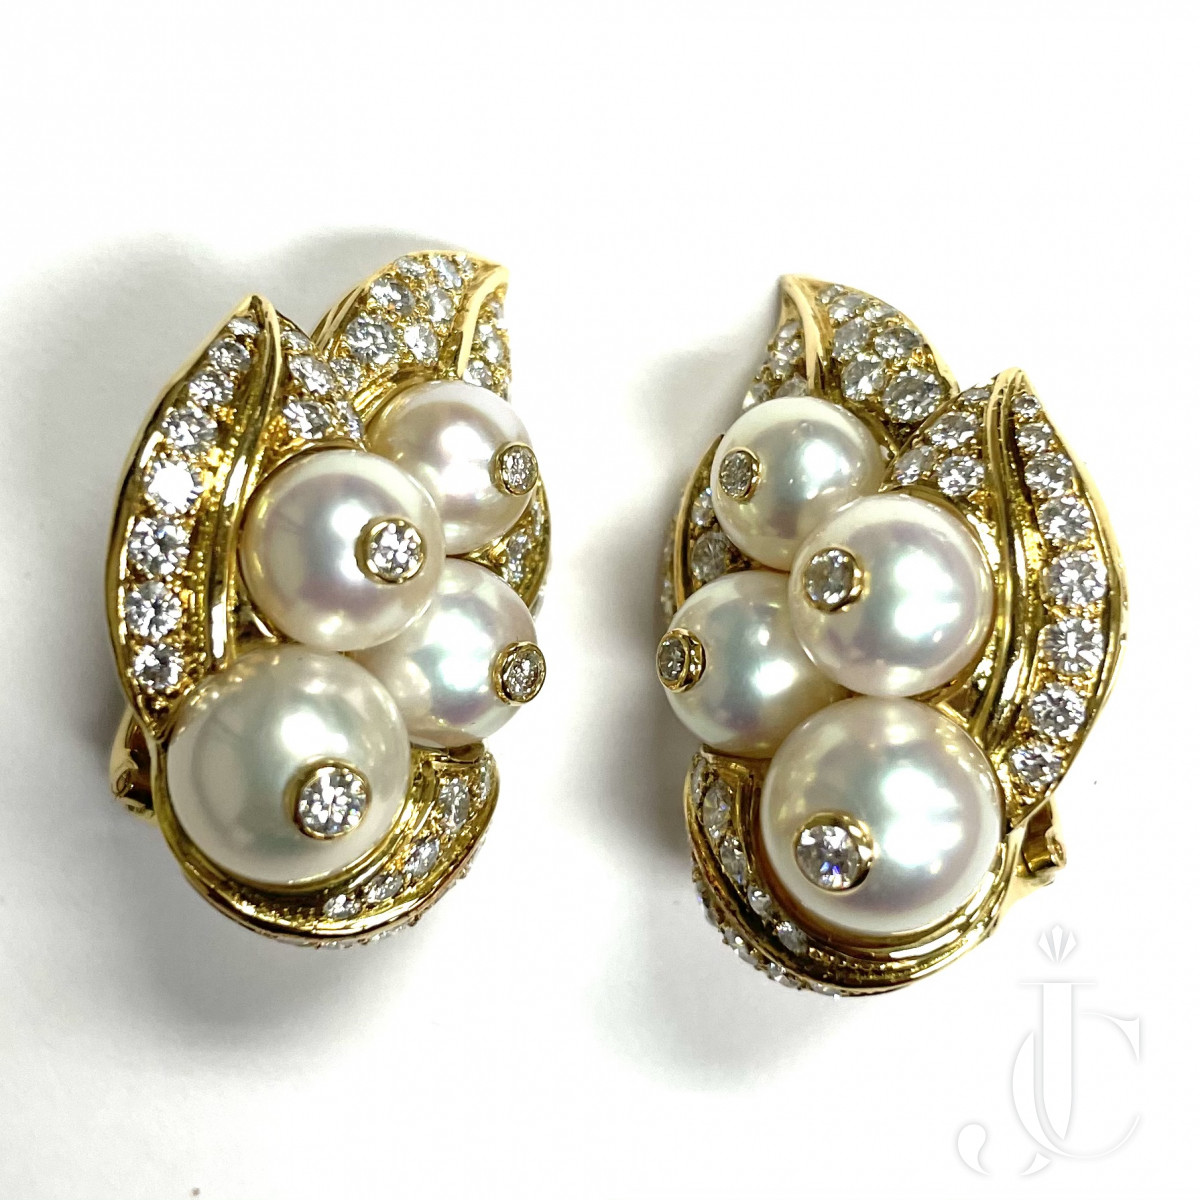 18 KT YG Pearl and Diamond pair of Earrings